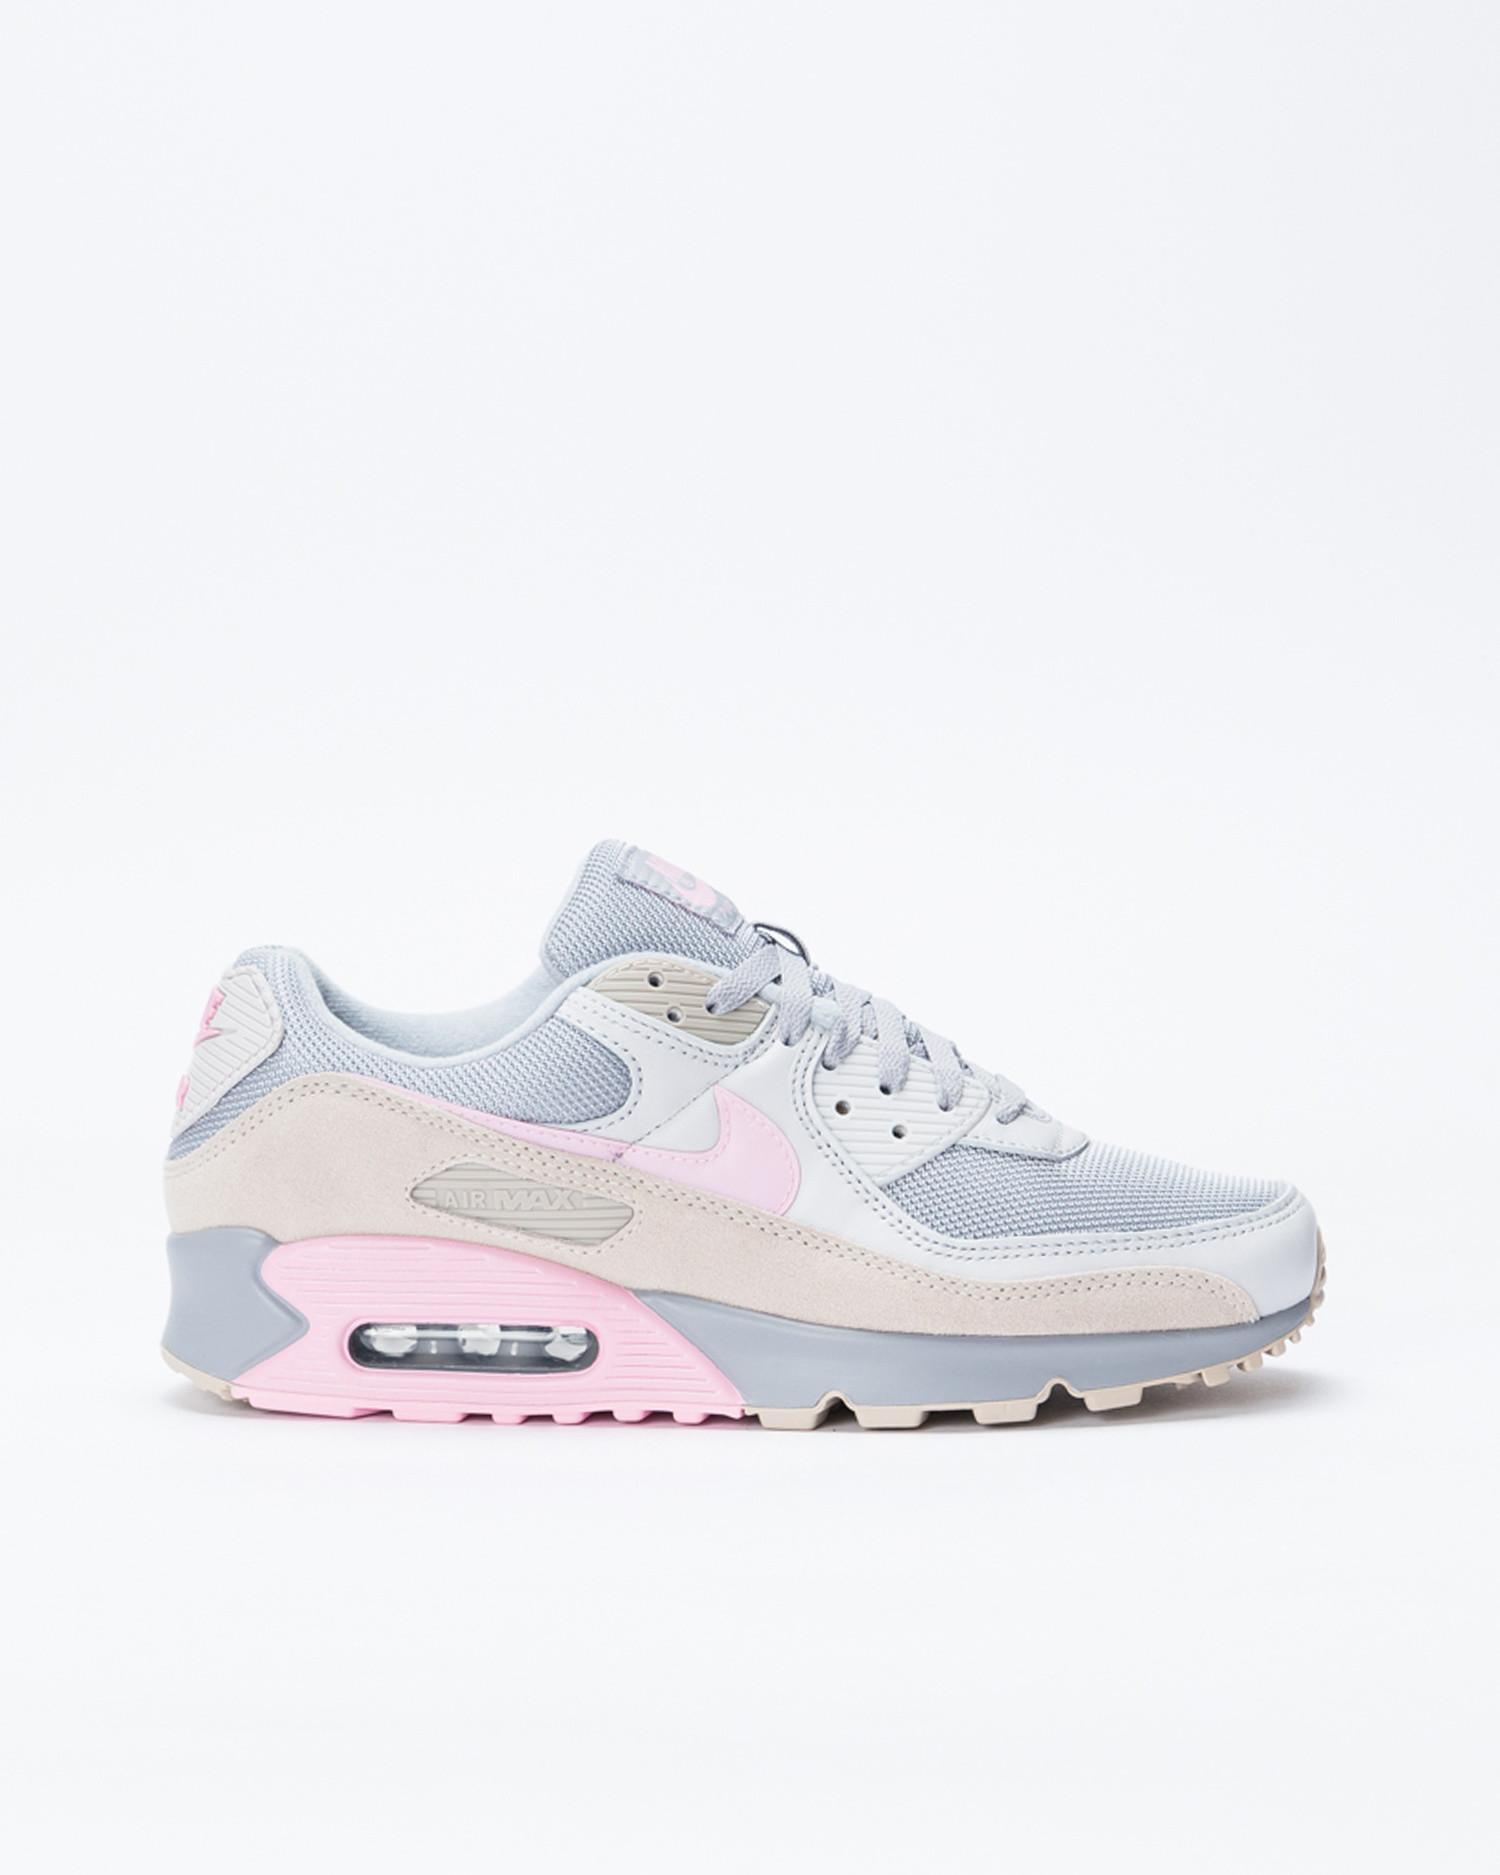 Nike Air Max 90 vast grey/pink-wolf grey-string